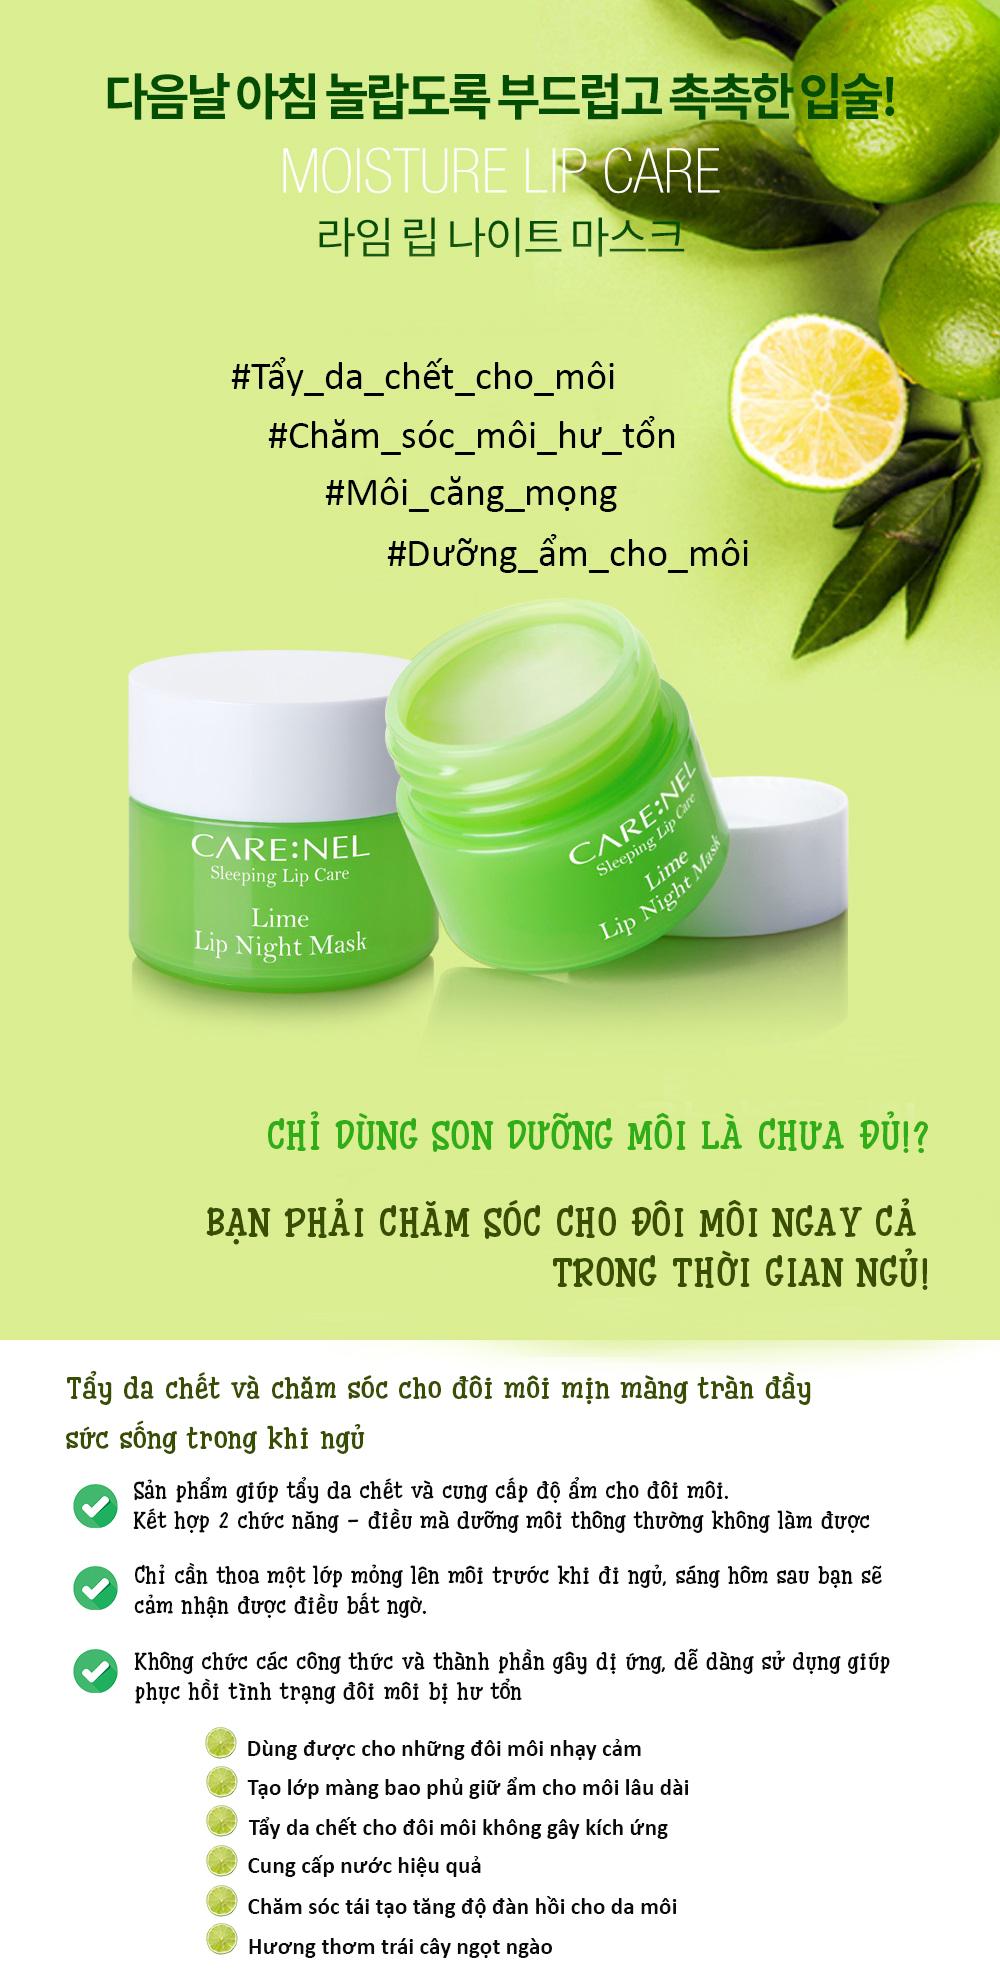 Mat Na Ngu Carenel Lime Lip Night Mask (2)